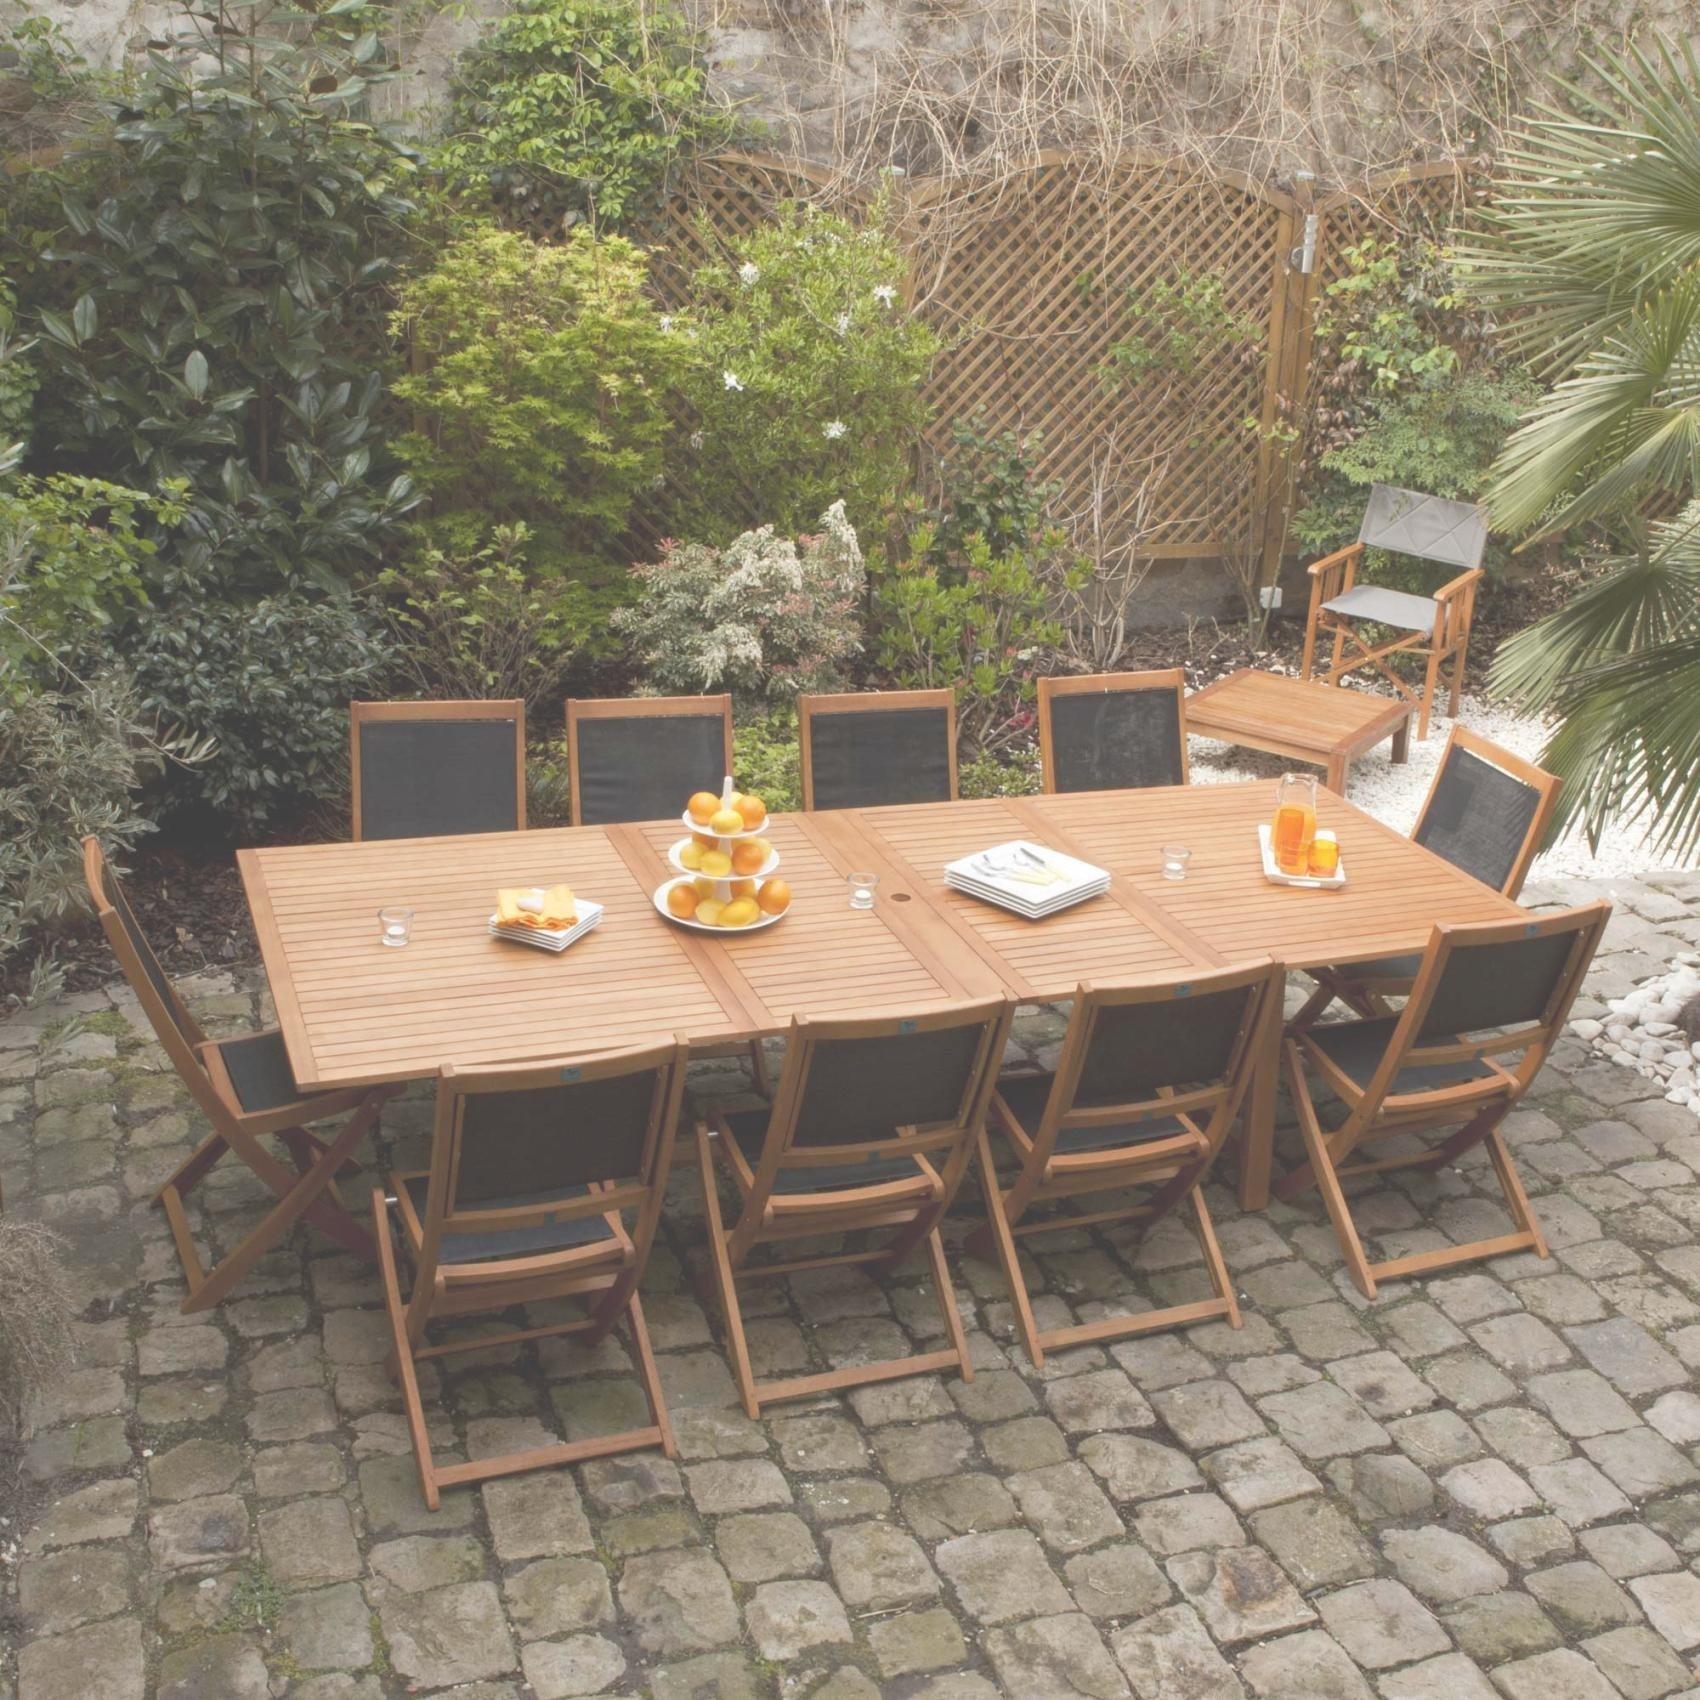 Meuble Salle De Bain Weldom Inspirant Photographie Salon De Jardin Weldom Aussi Haut Génial Table De Jardin En Teck